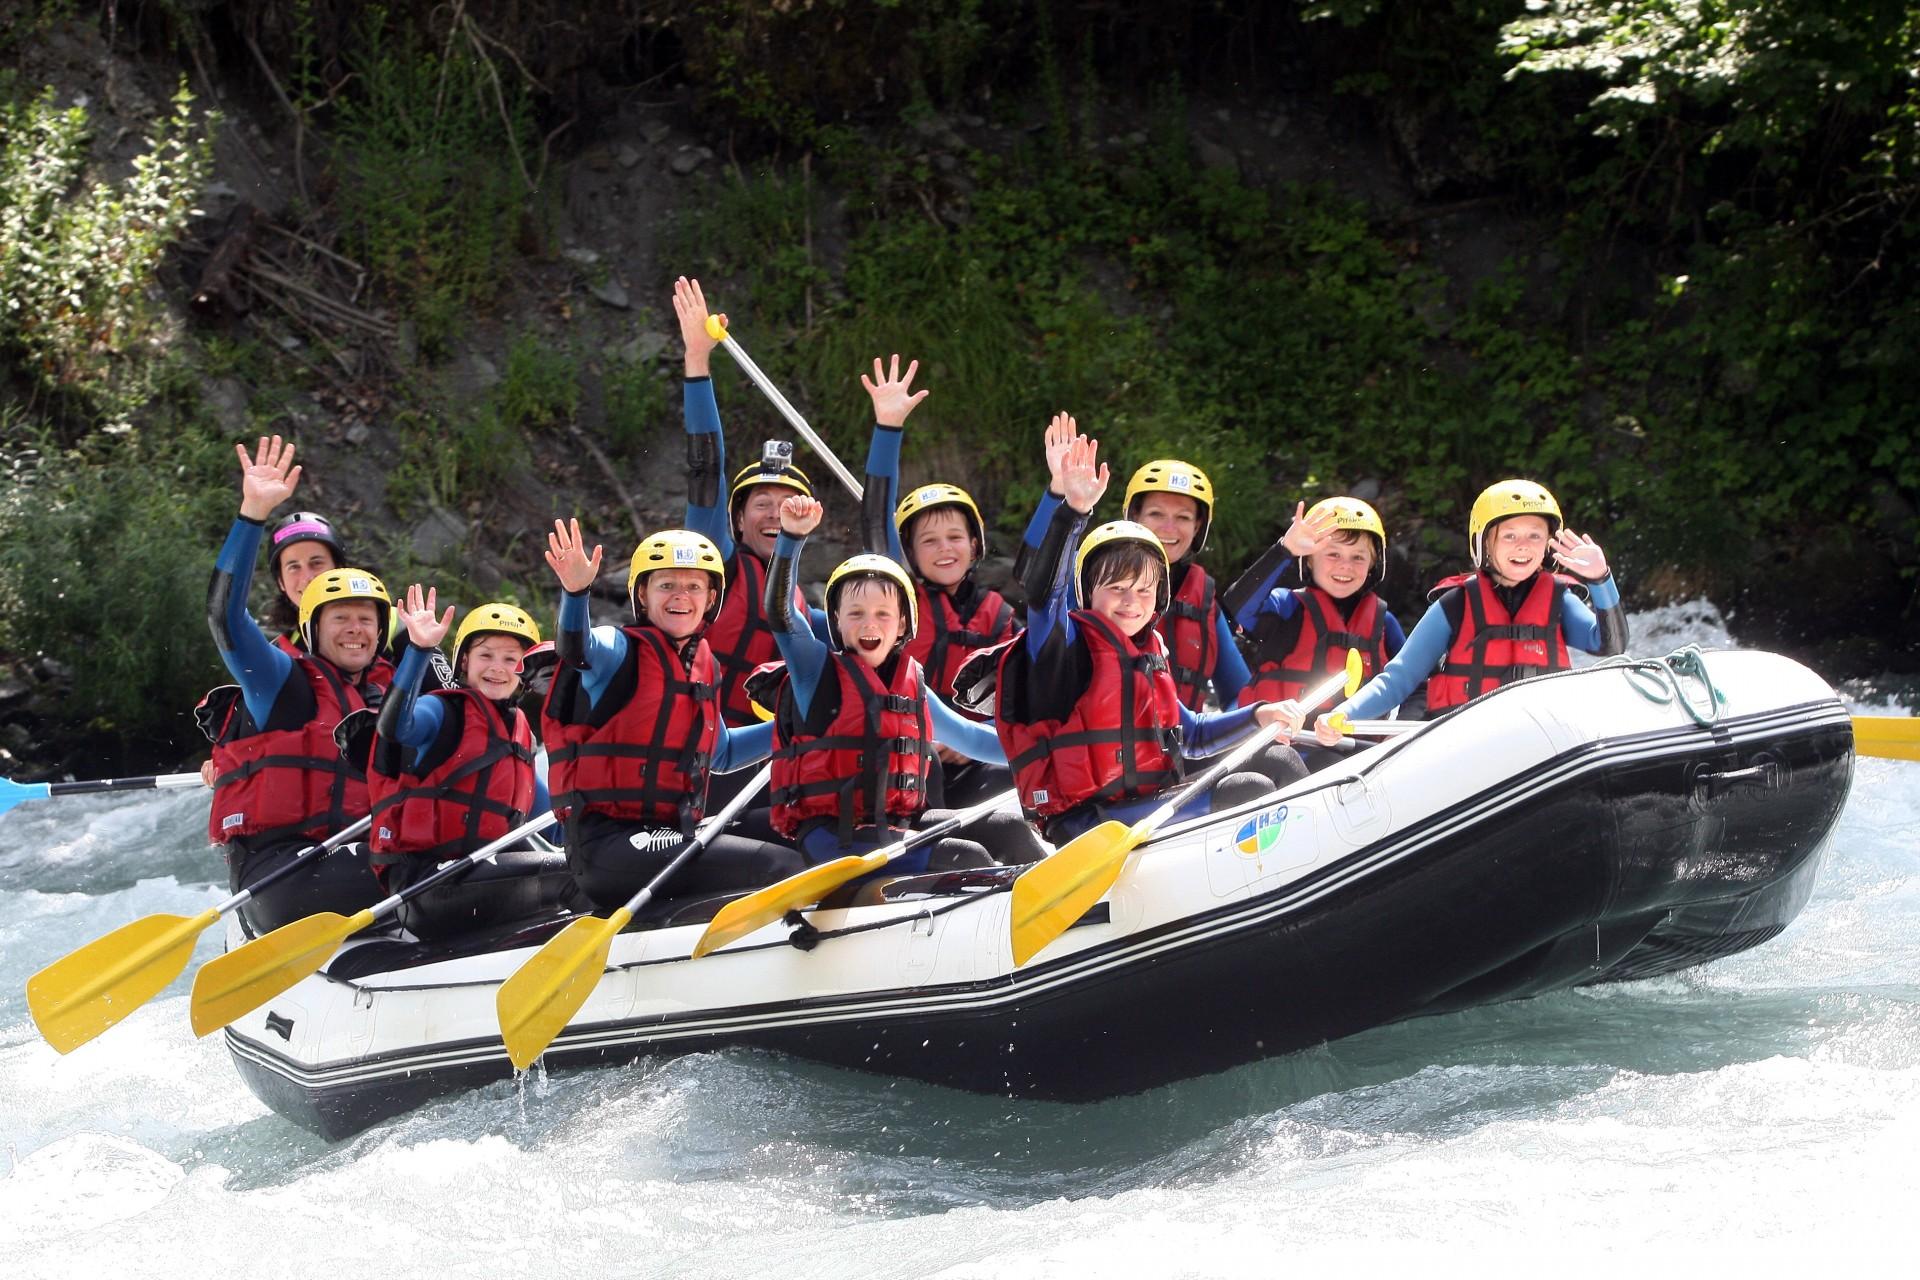 raft-enfant-peisey-vallandry-h2o-h2osports-57338